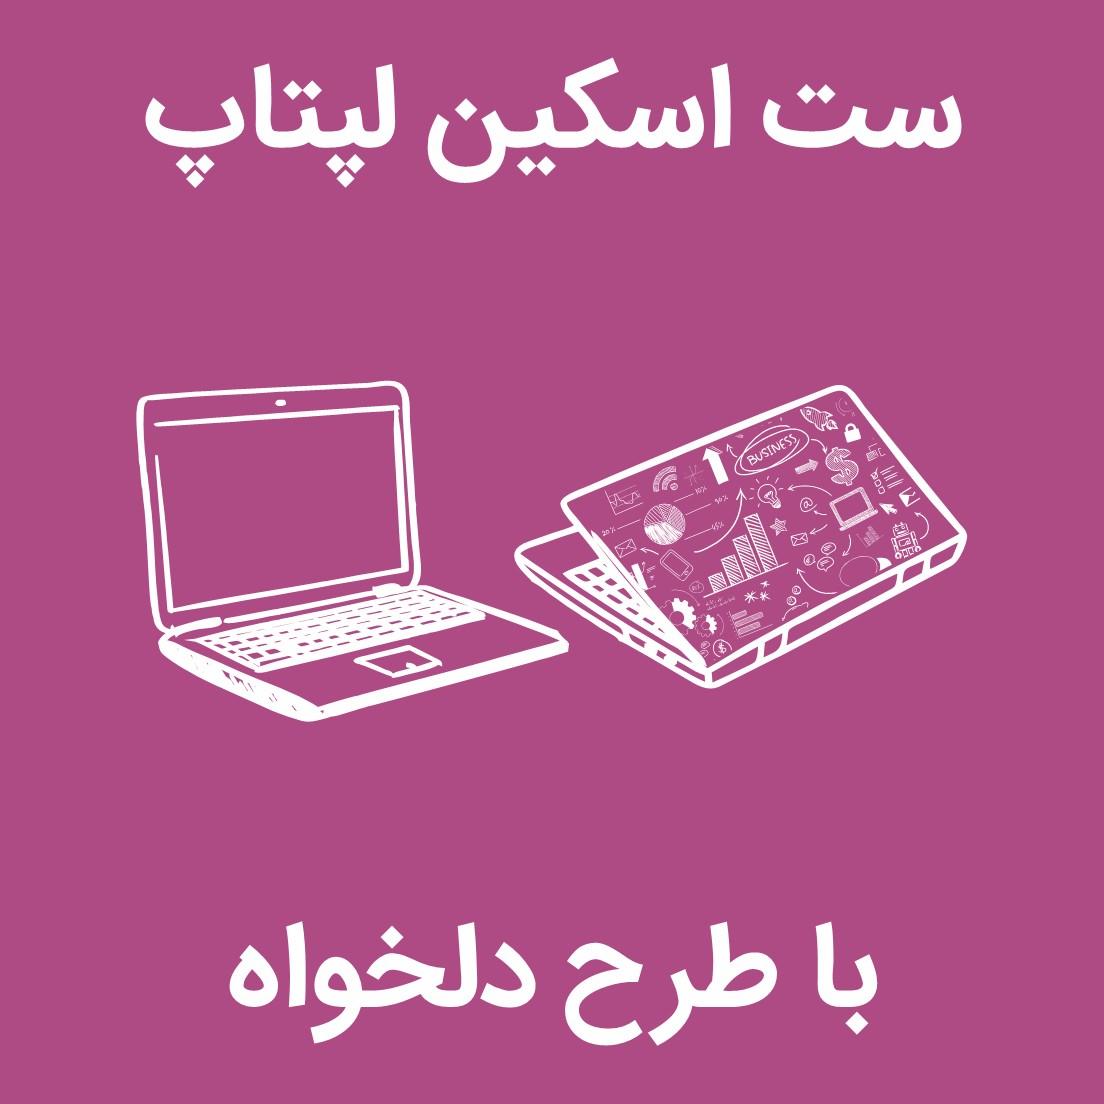 اسکین لپ تاپ هاماگراف برچسب کیبورد لپ تاپ استیکر لپ تاپ کالا استیکر لپ تاپ برنامه نویسی کاور لپ تاپ